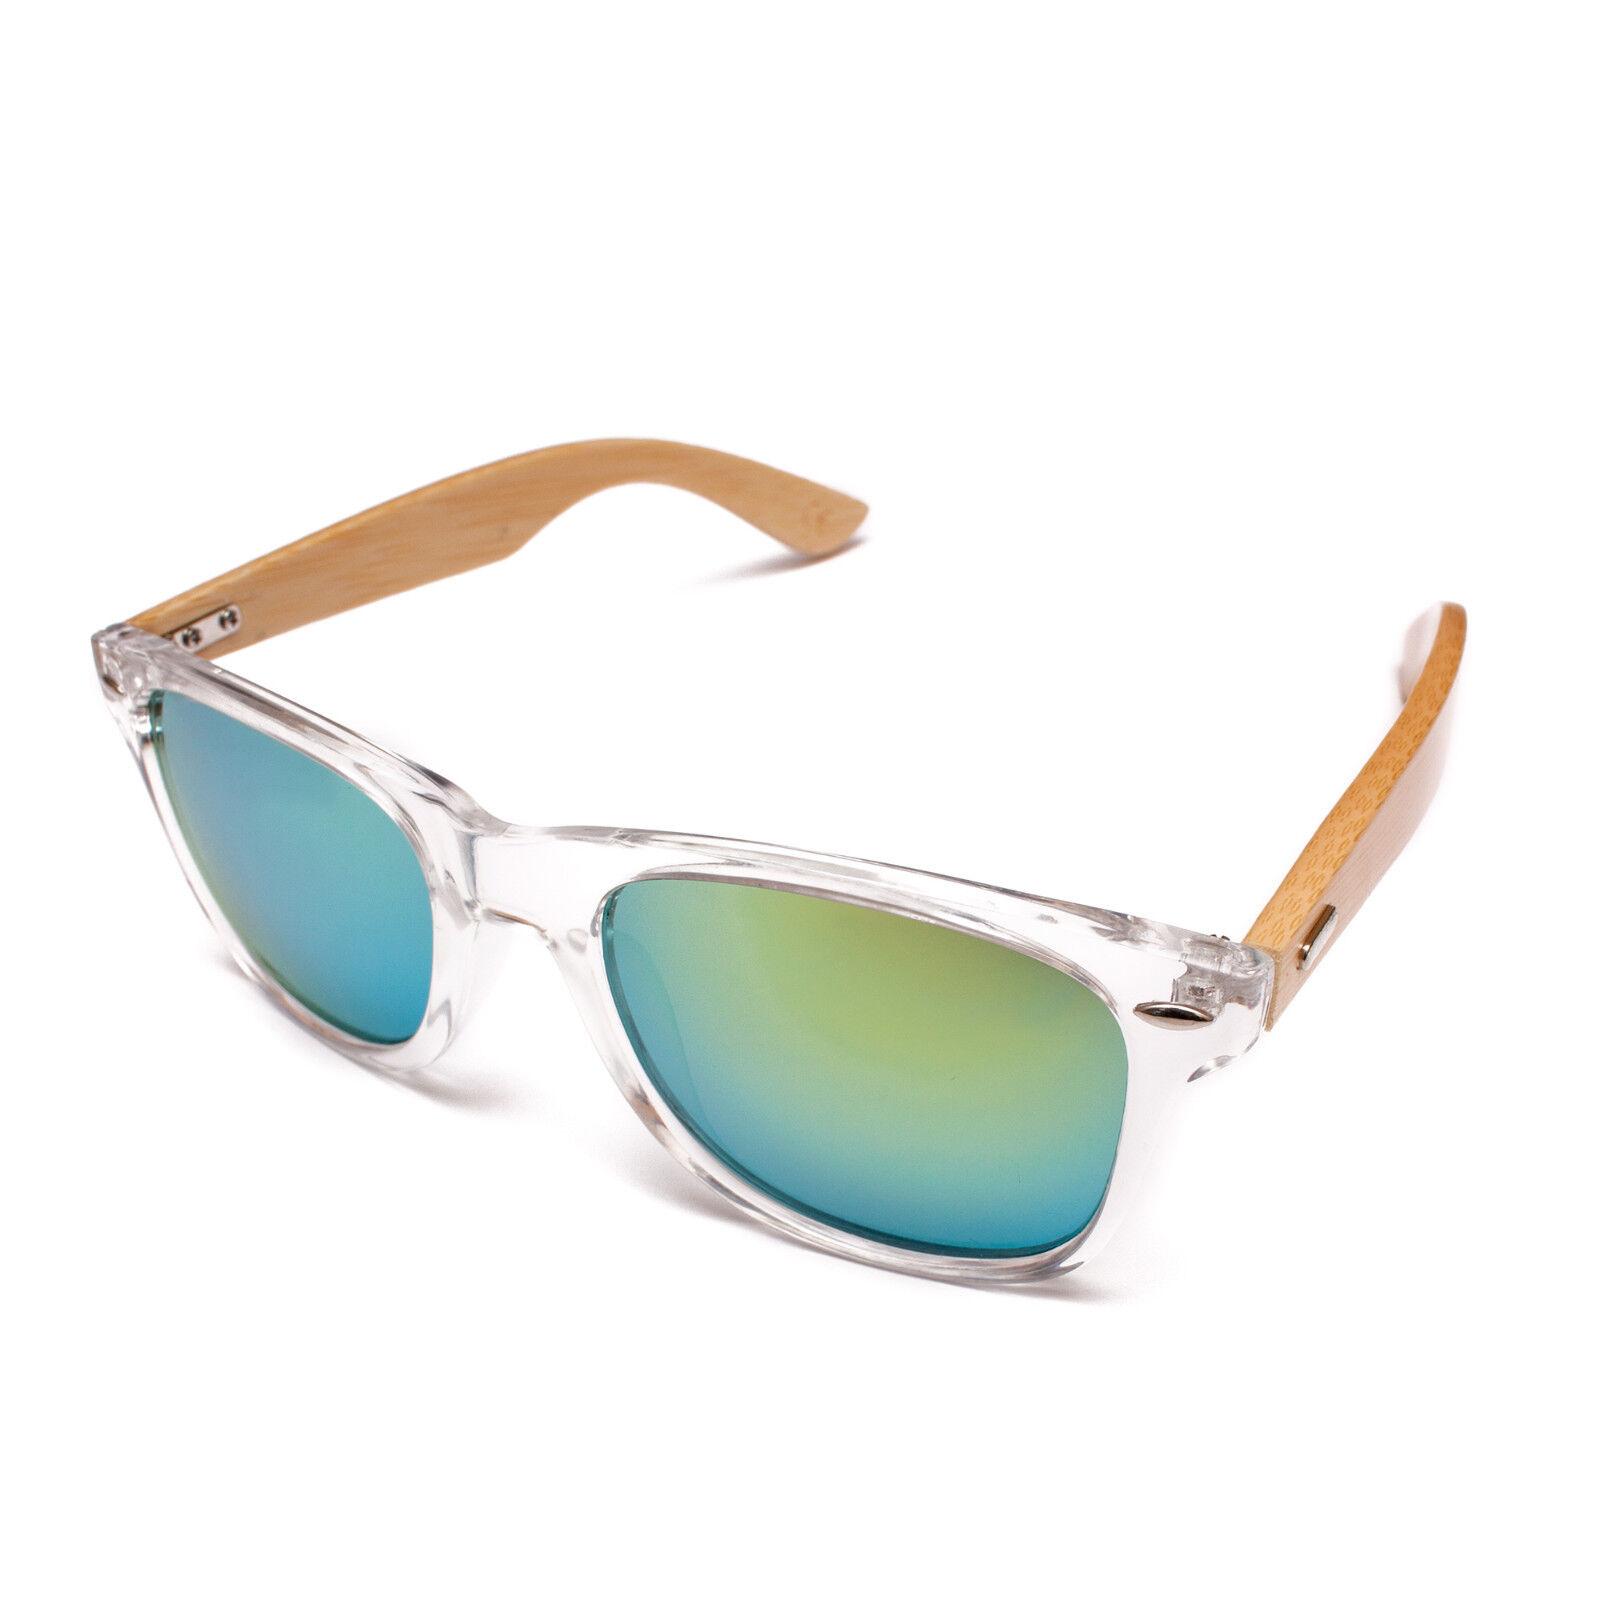 Clear Transparent Frame Sunglasses Bamboo Wood Mirror Green Blue Mens Womens Rad